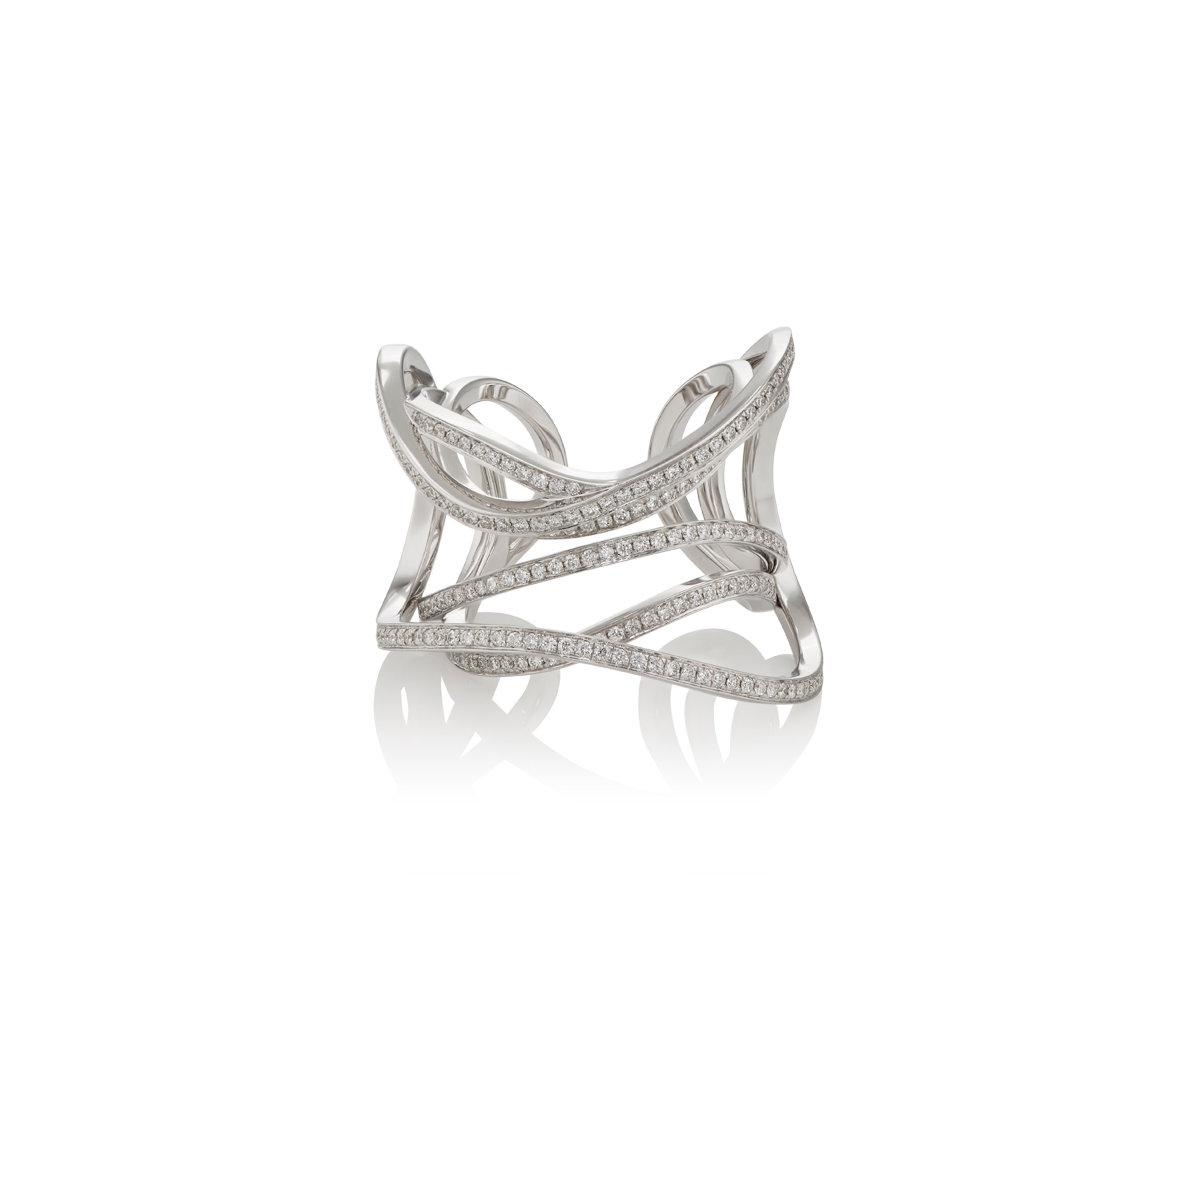 Womens Serpentine Cuff Ring Dauphin kDFHXfcj